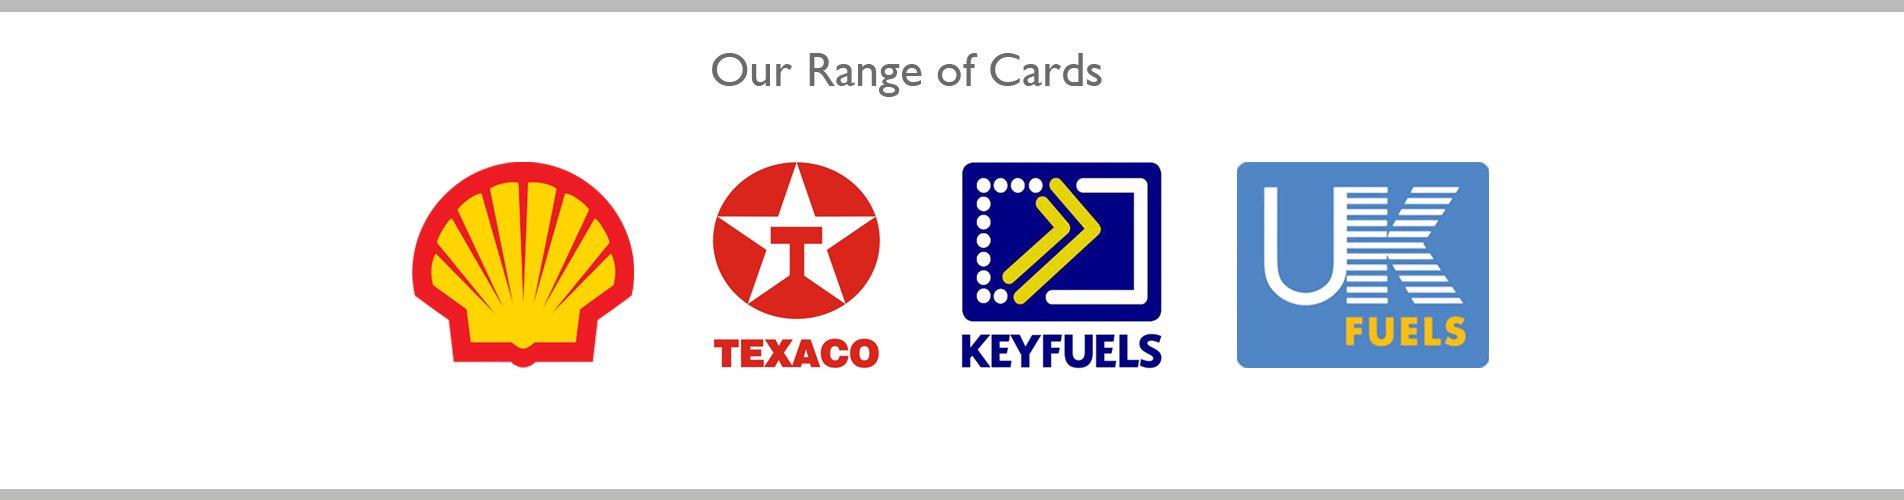 client logos shell texaco keyfuels ukfuels